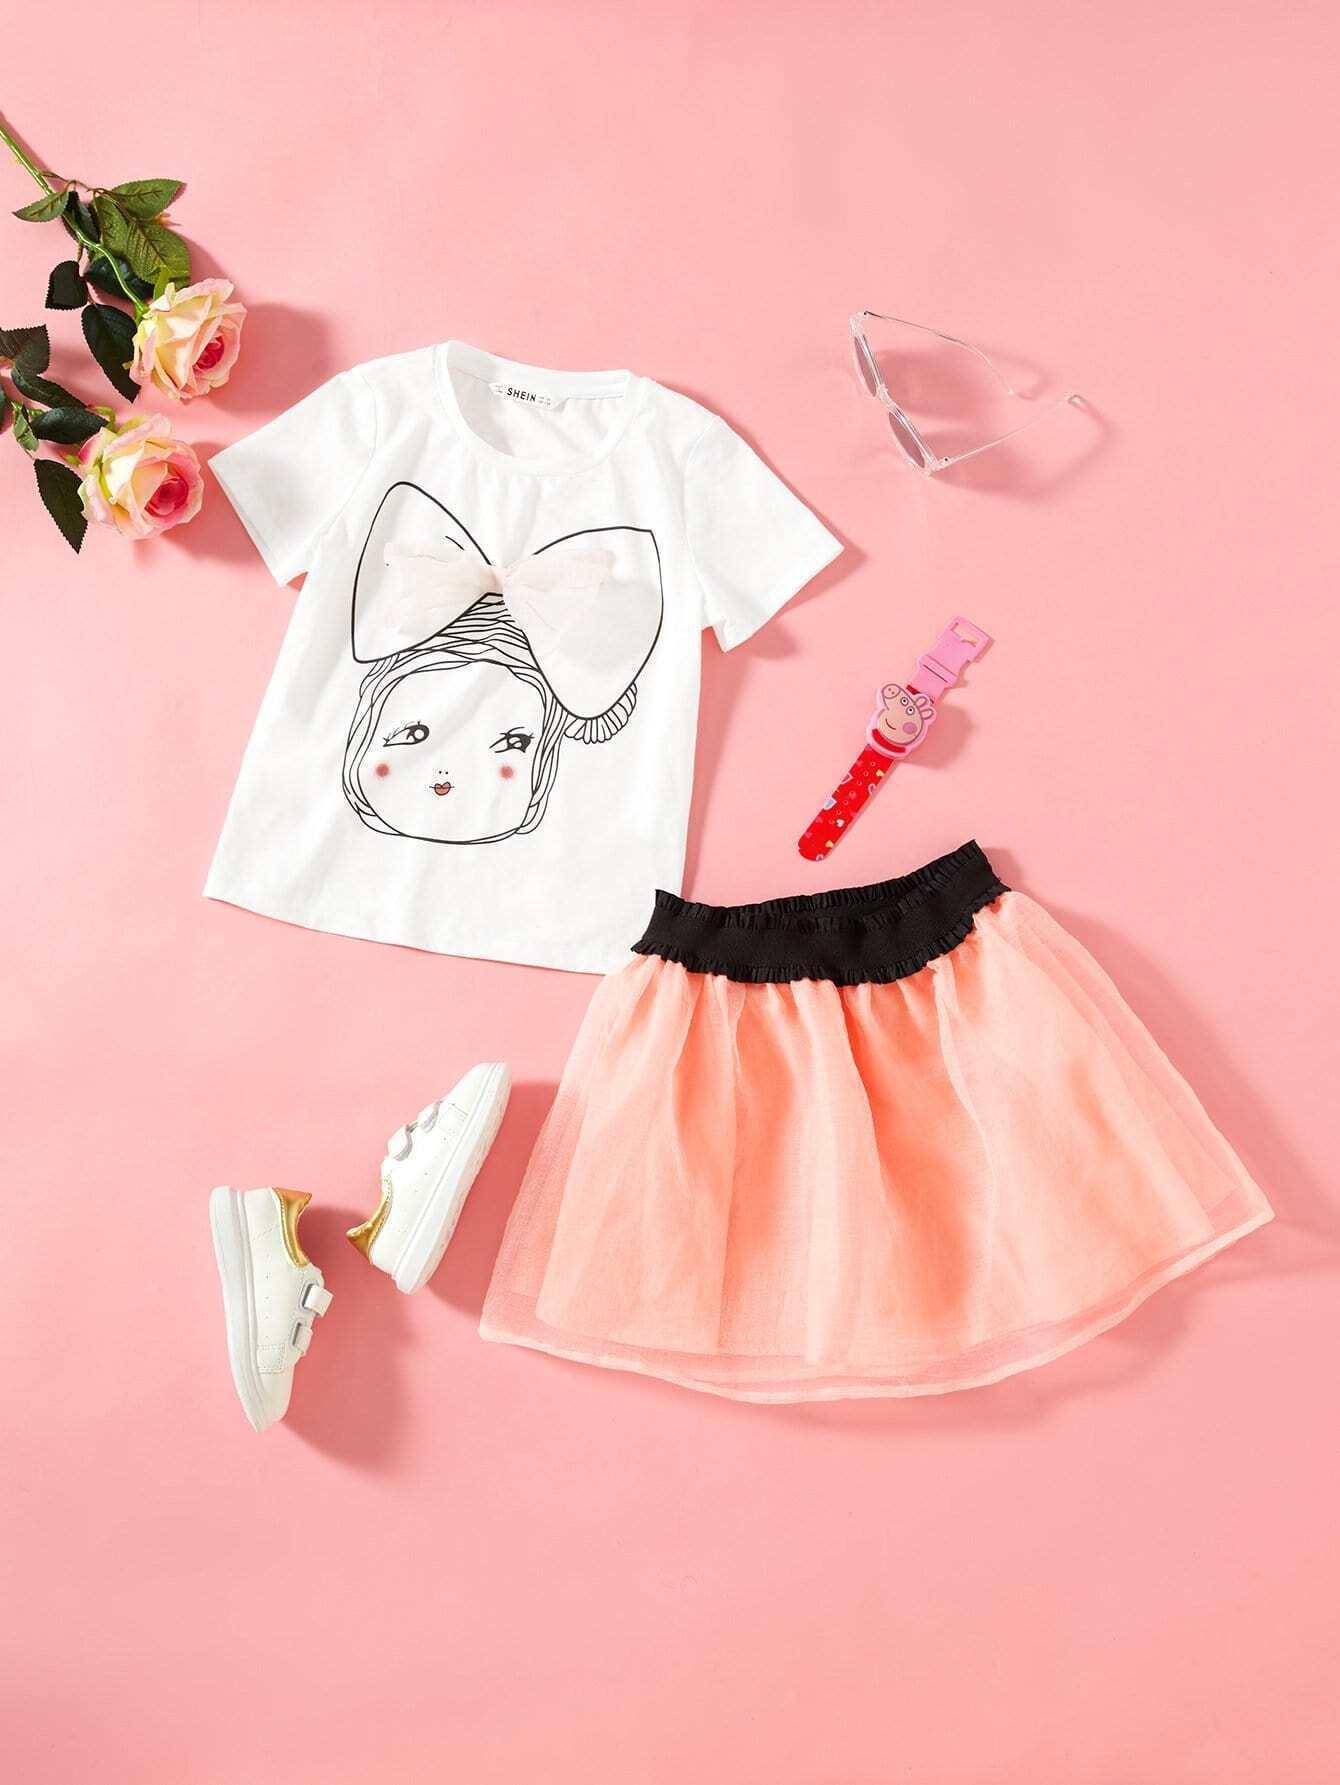 Girls Bow Front Figure Print Top & Mesh Skirt Set spongebob squarepants pvc anime figures 8 figure set